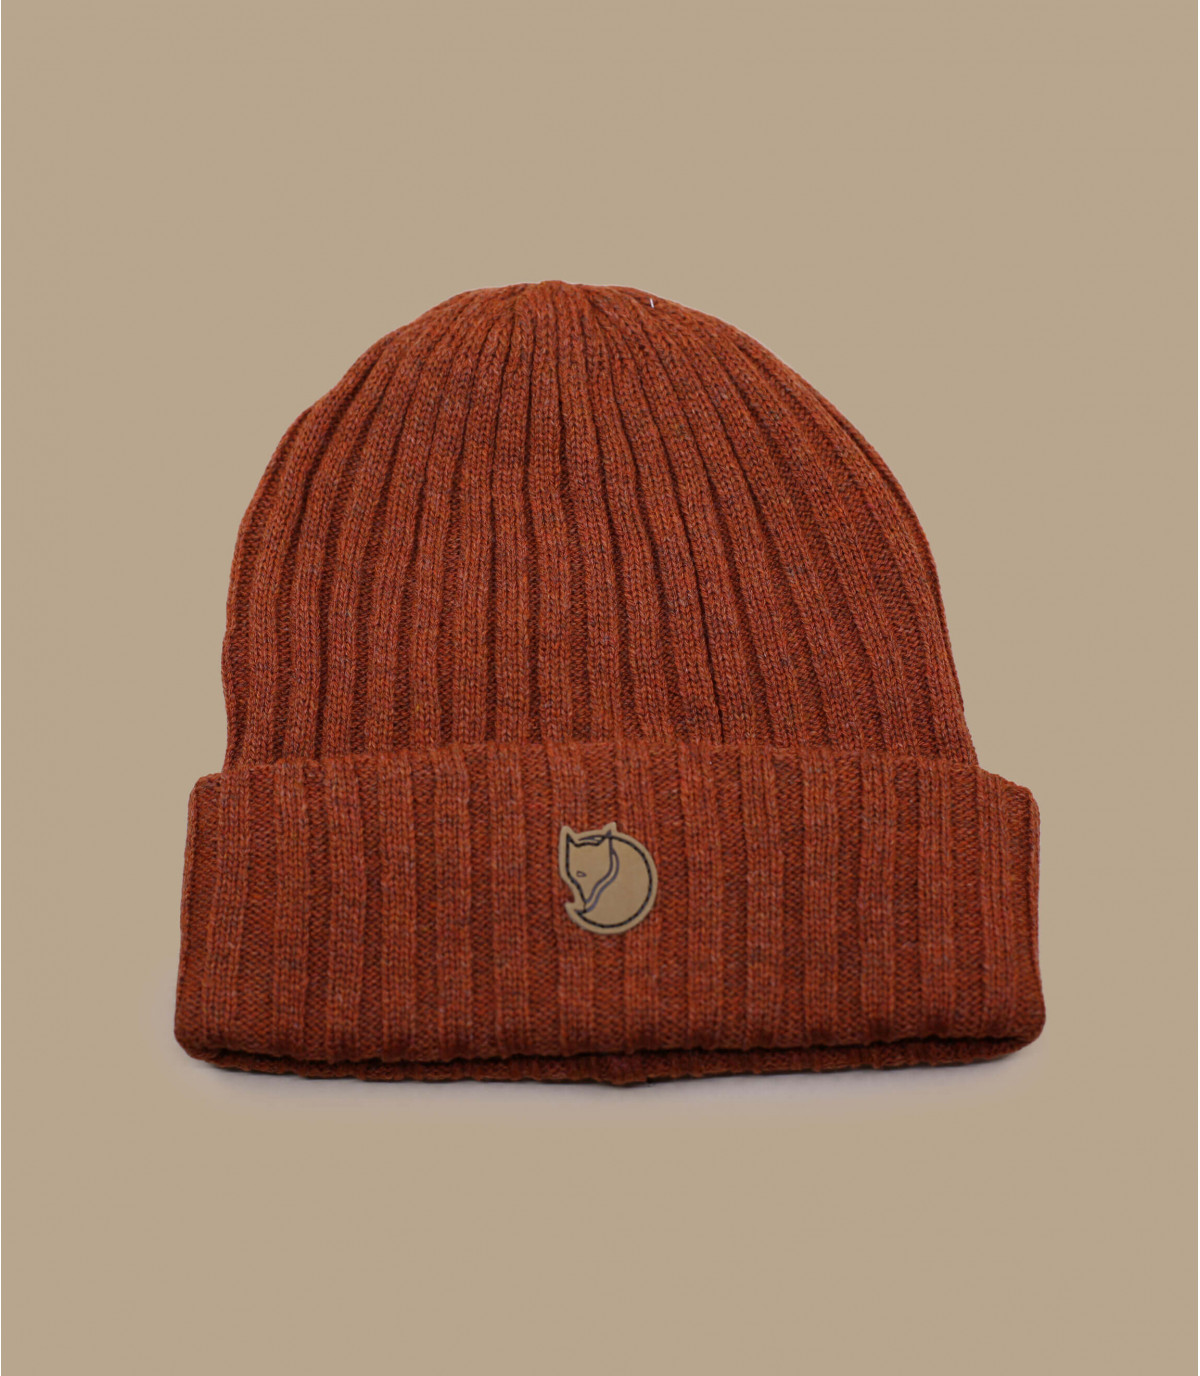 Mütze Revers Fjällräven Rost